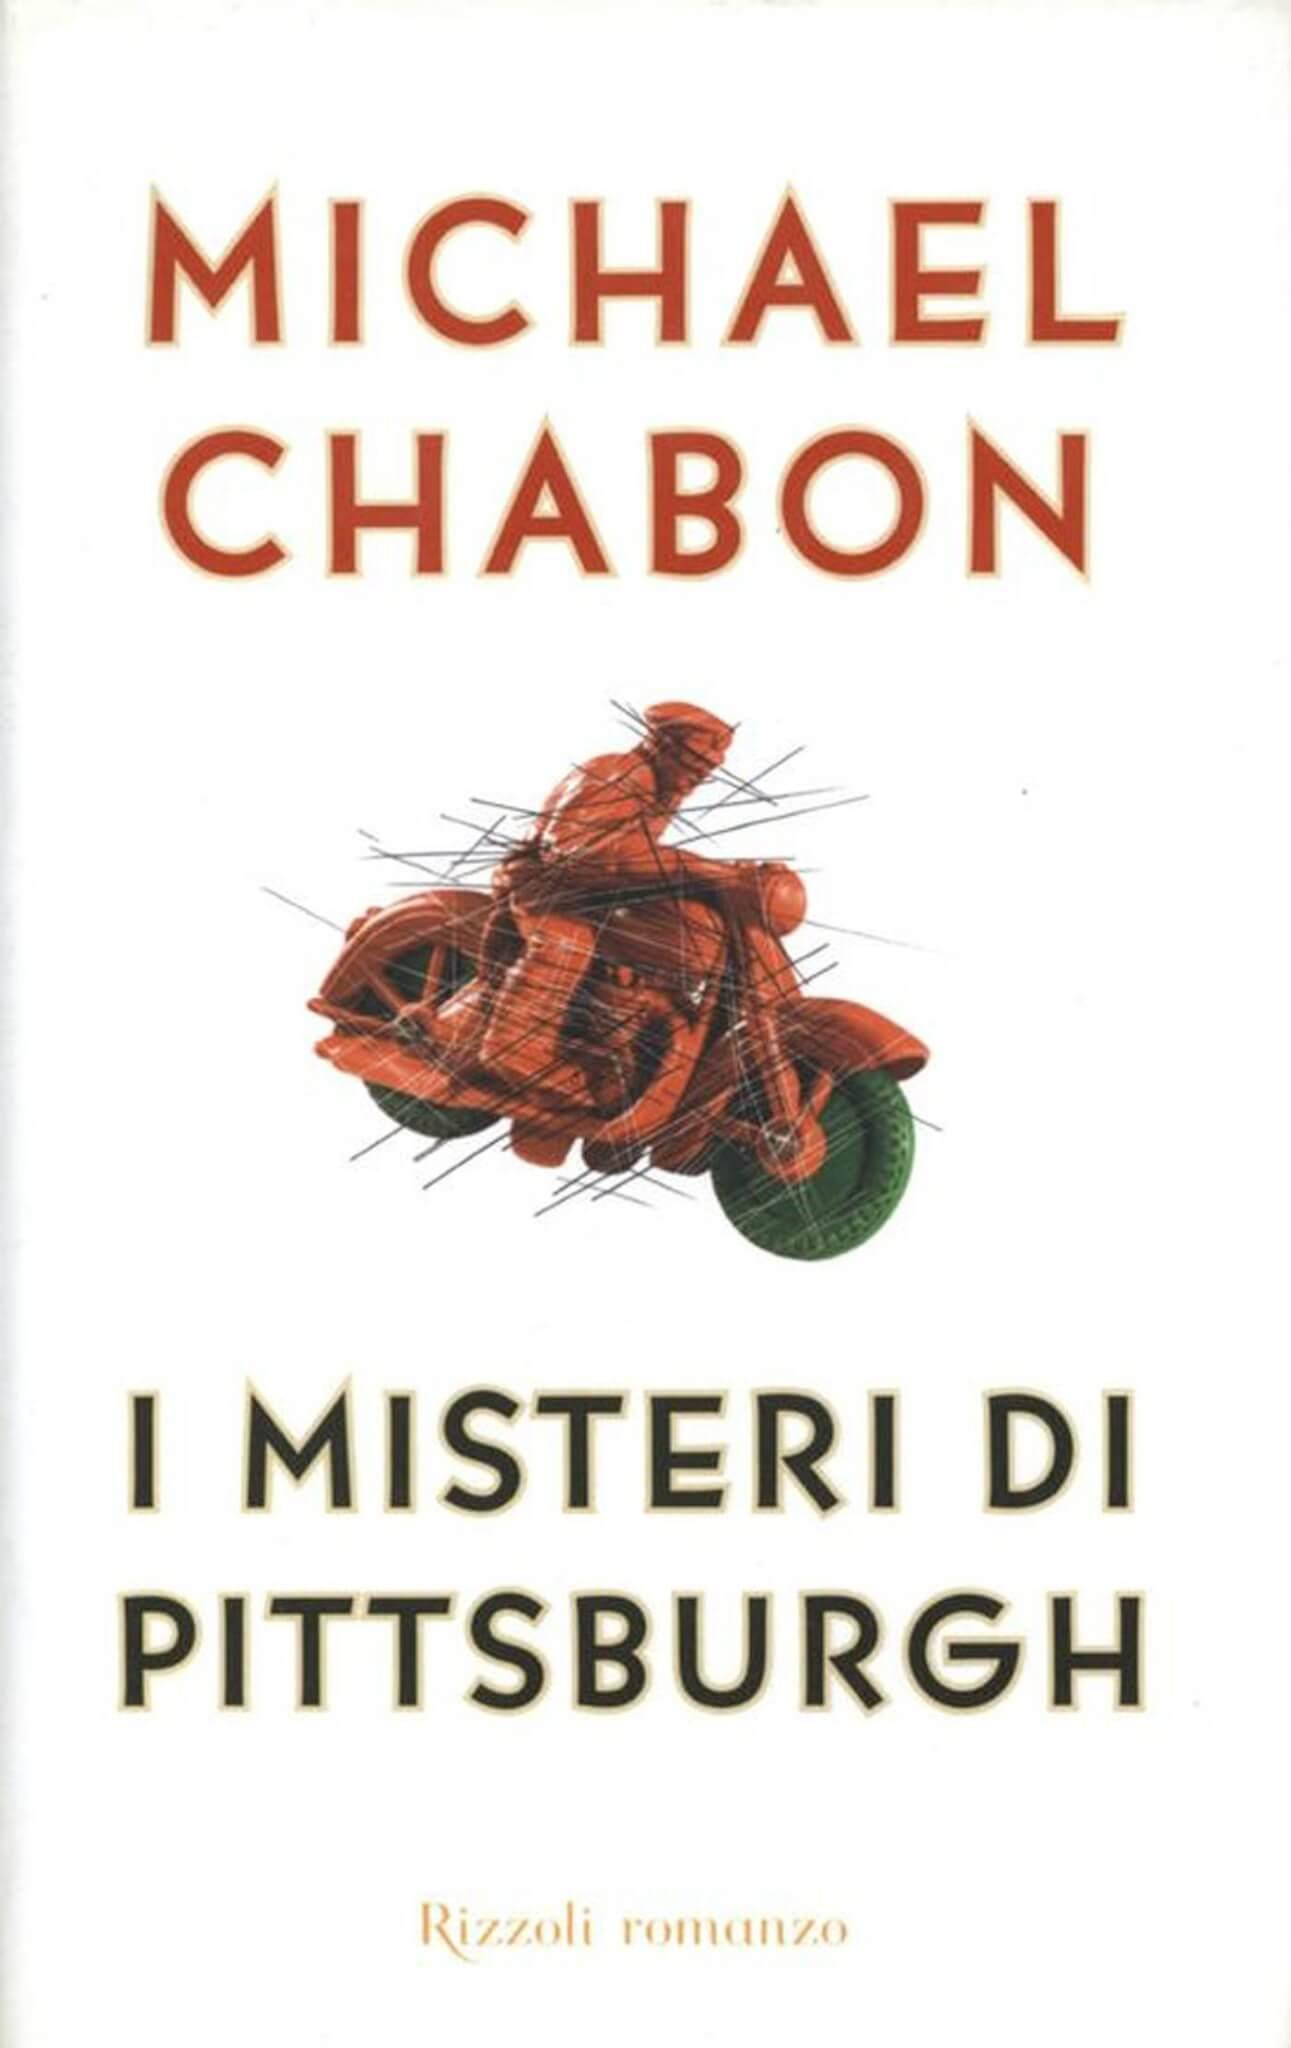 I Misteri di Pittsburgh - Michael Chabon